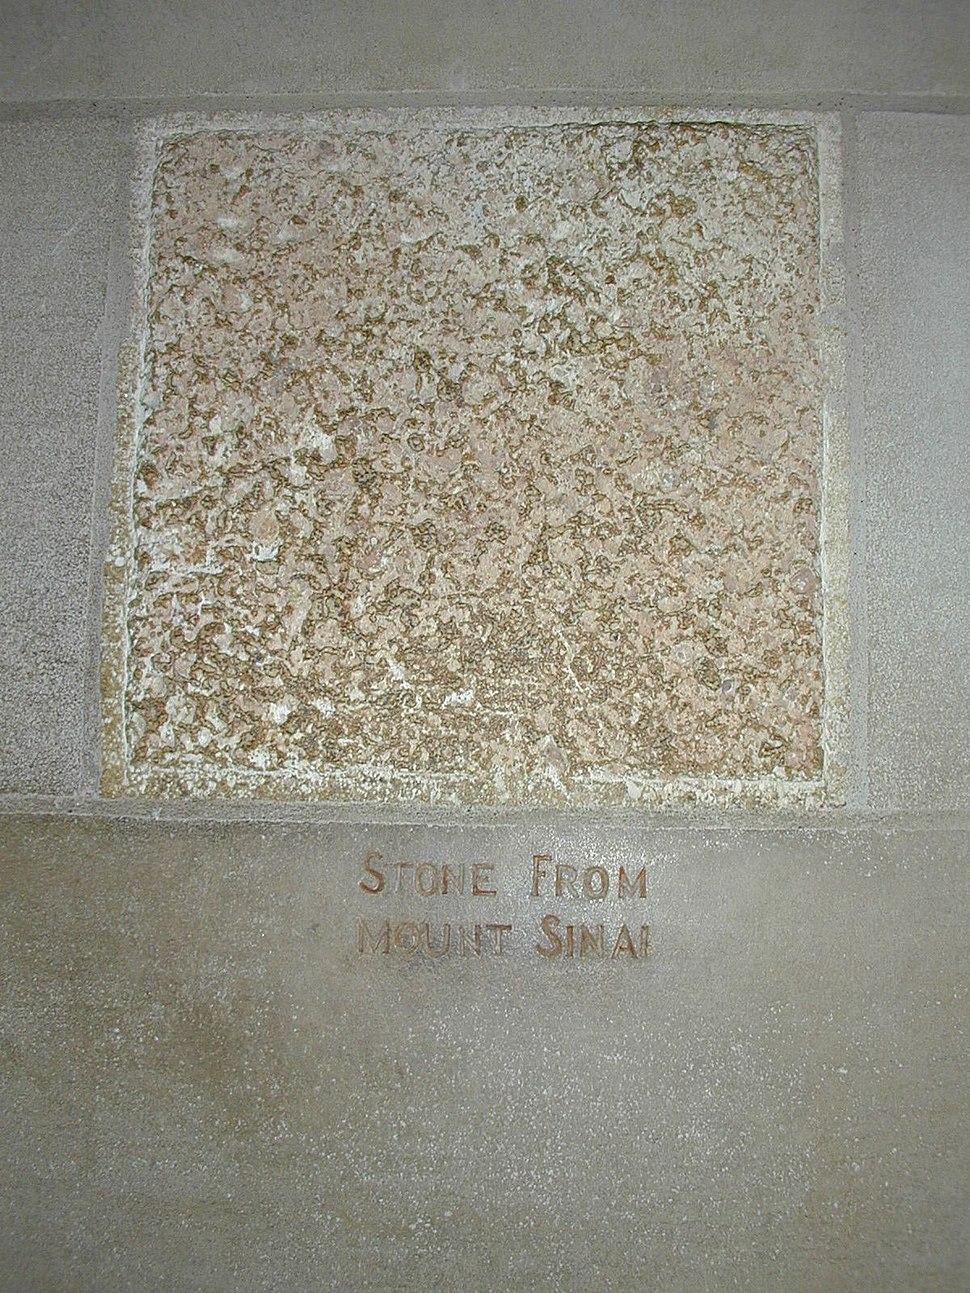 Mount Sinai stone at The Washington National Cathedral